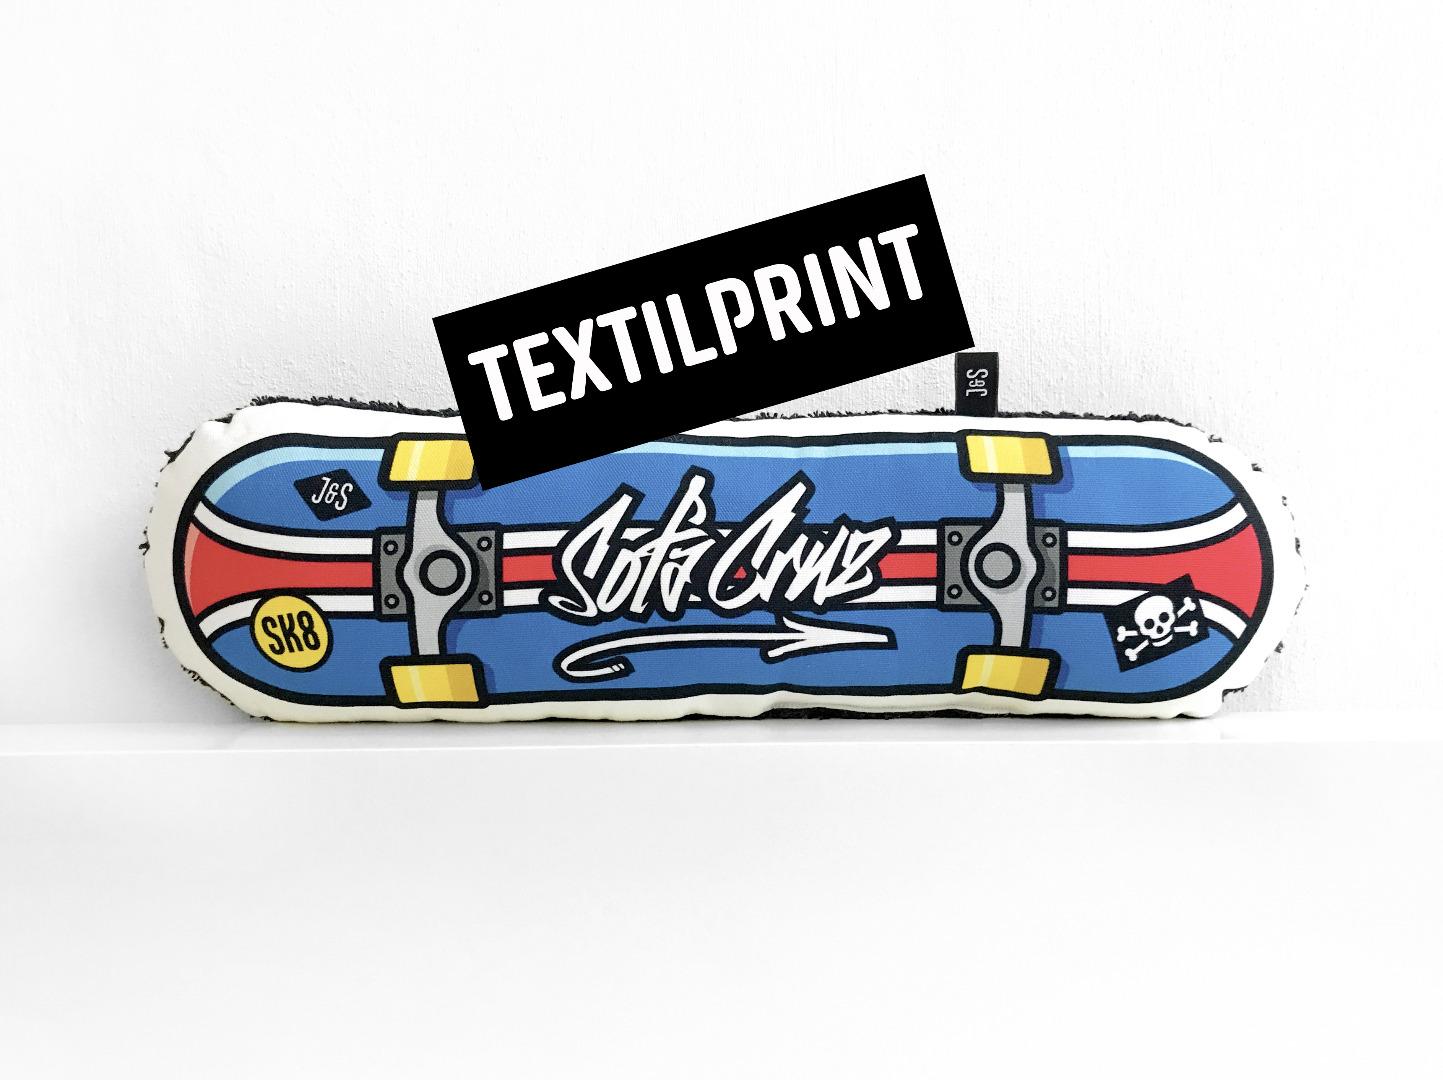 Textilprint zum selber nähen Skateboard Sofacruz